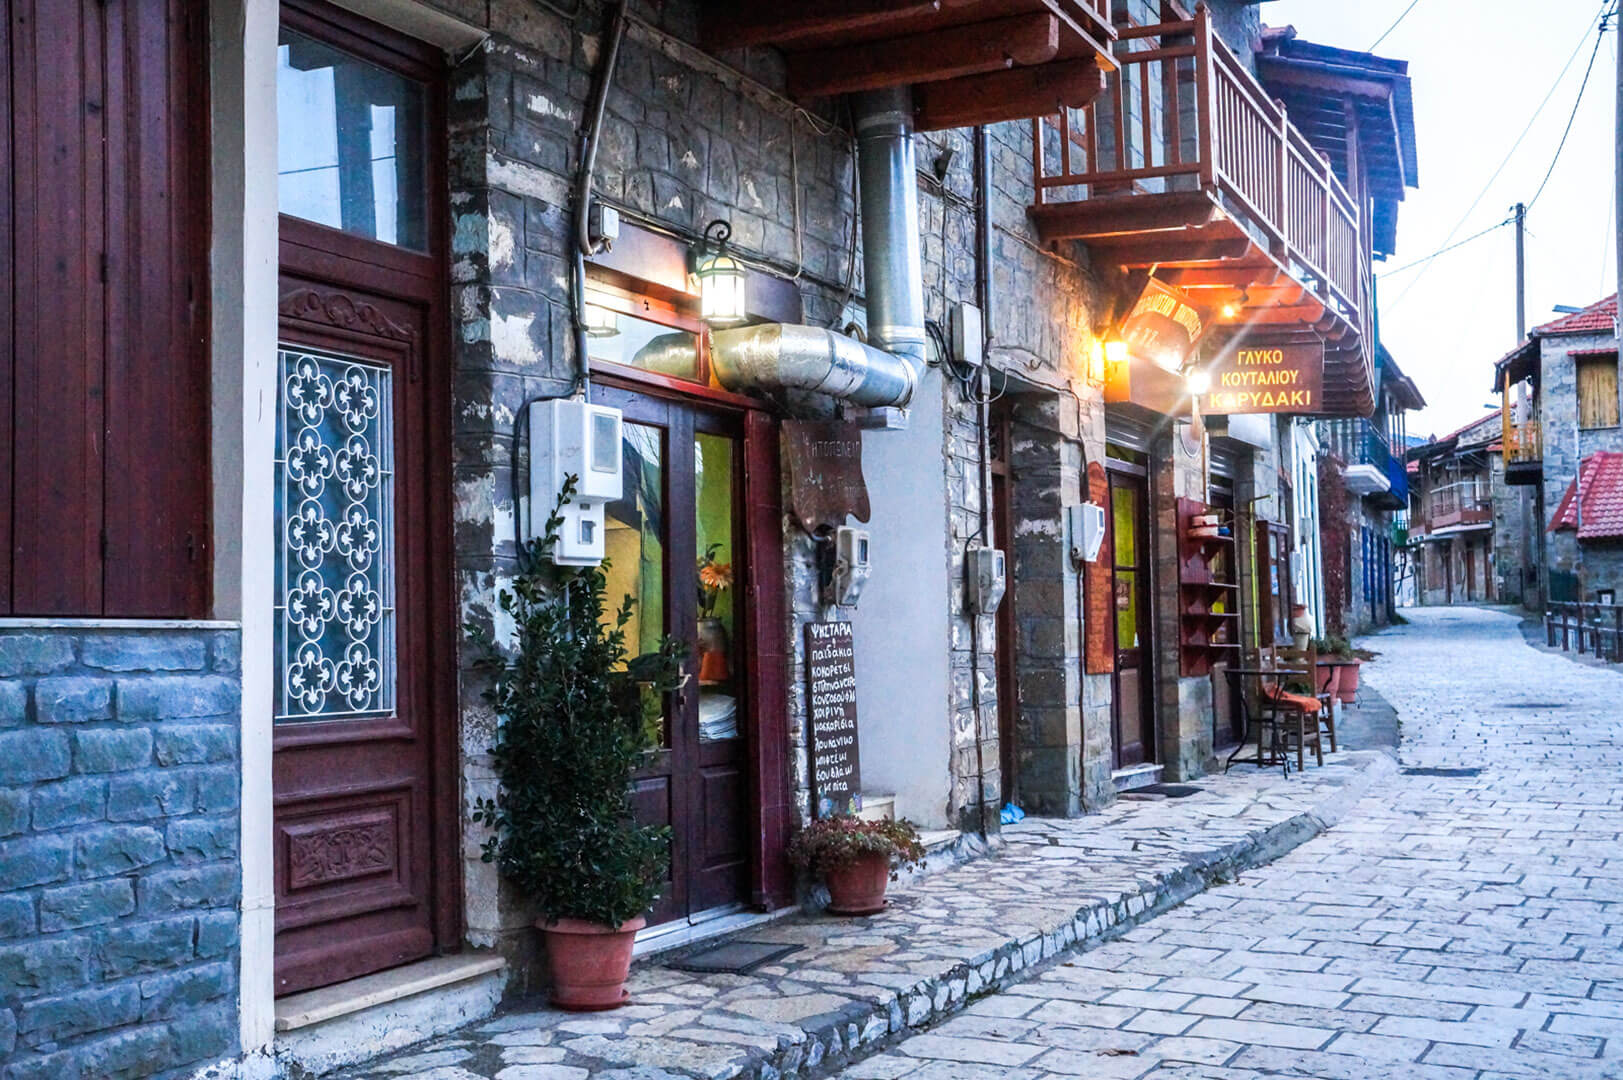 oreini-nafpaktia-greece-la-vie-en-blog-all-rights-reserved-23